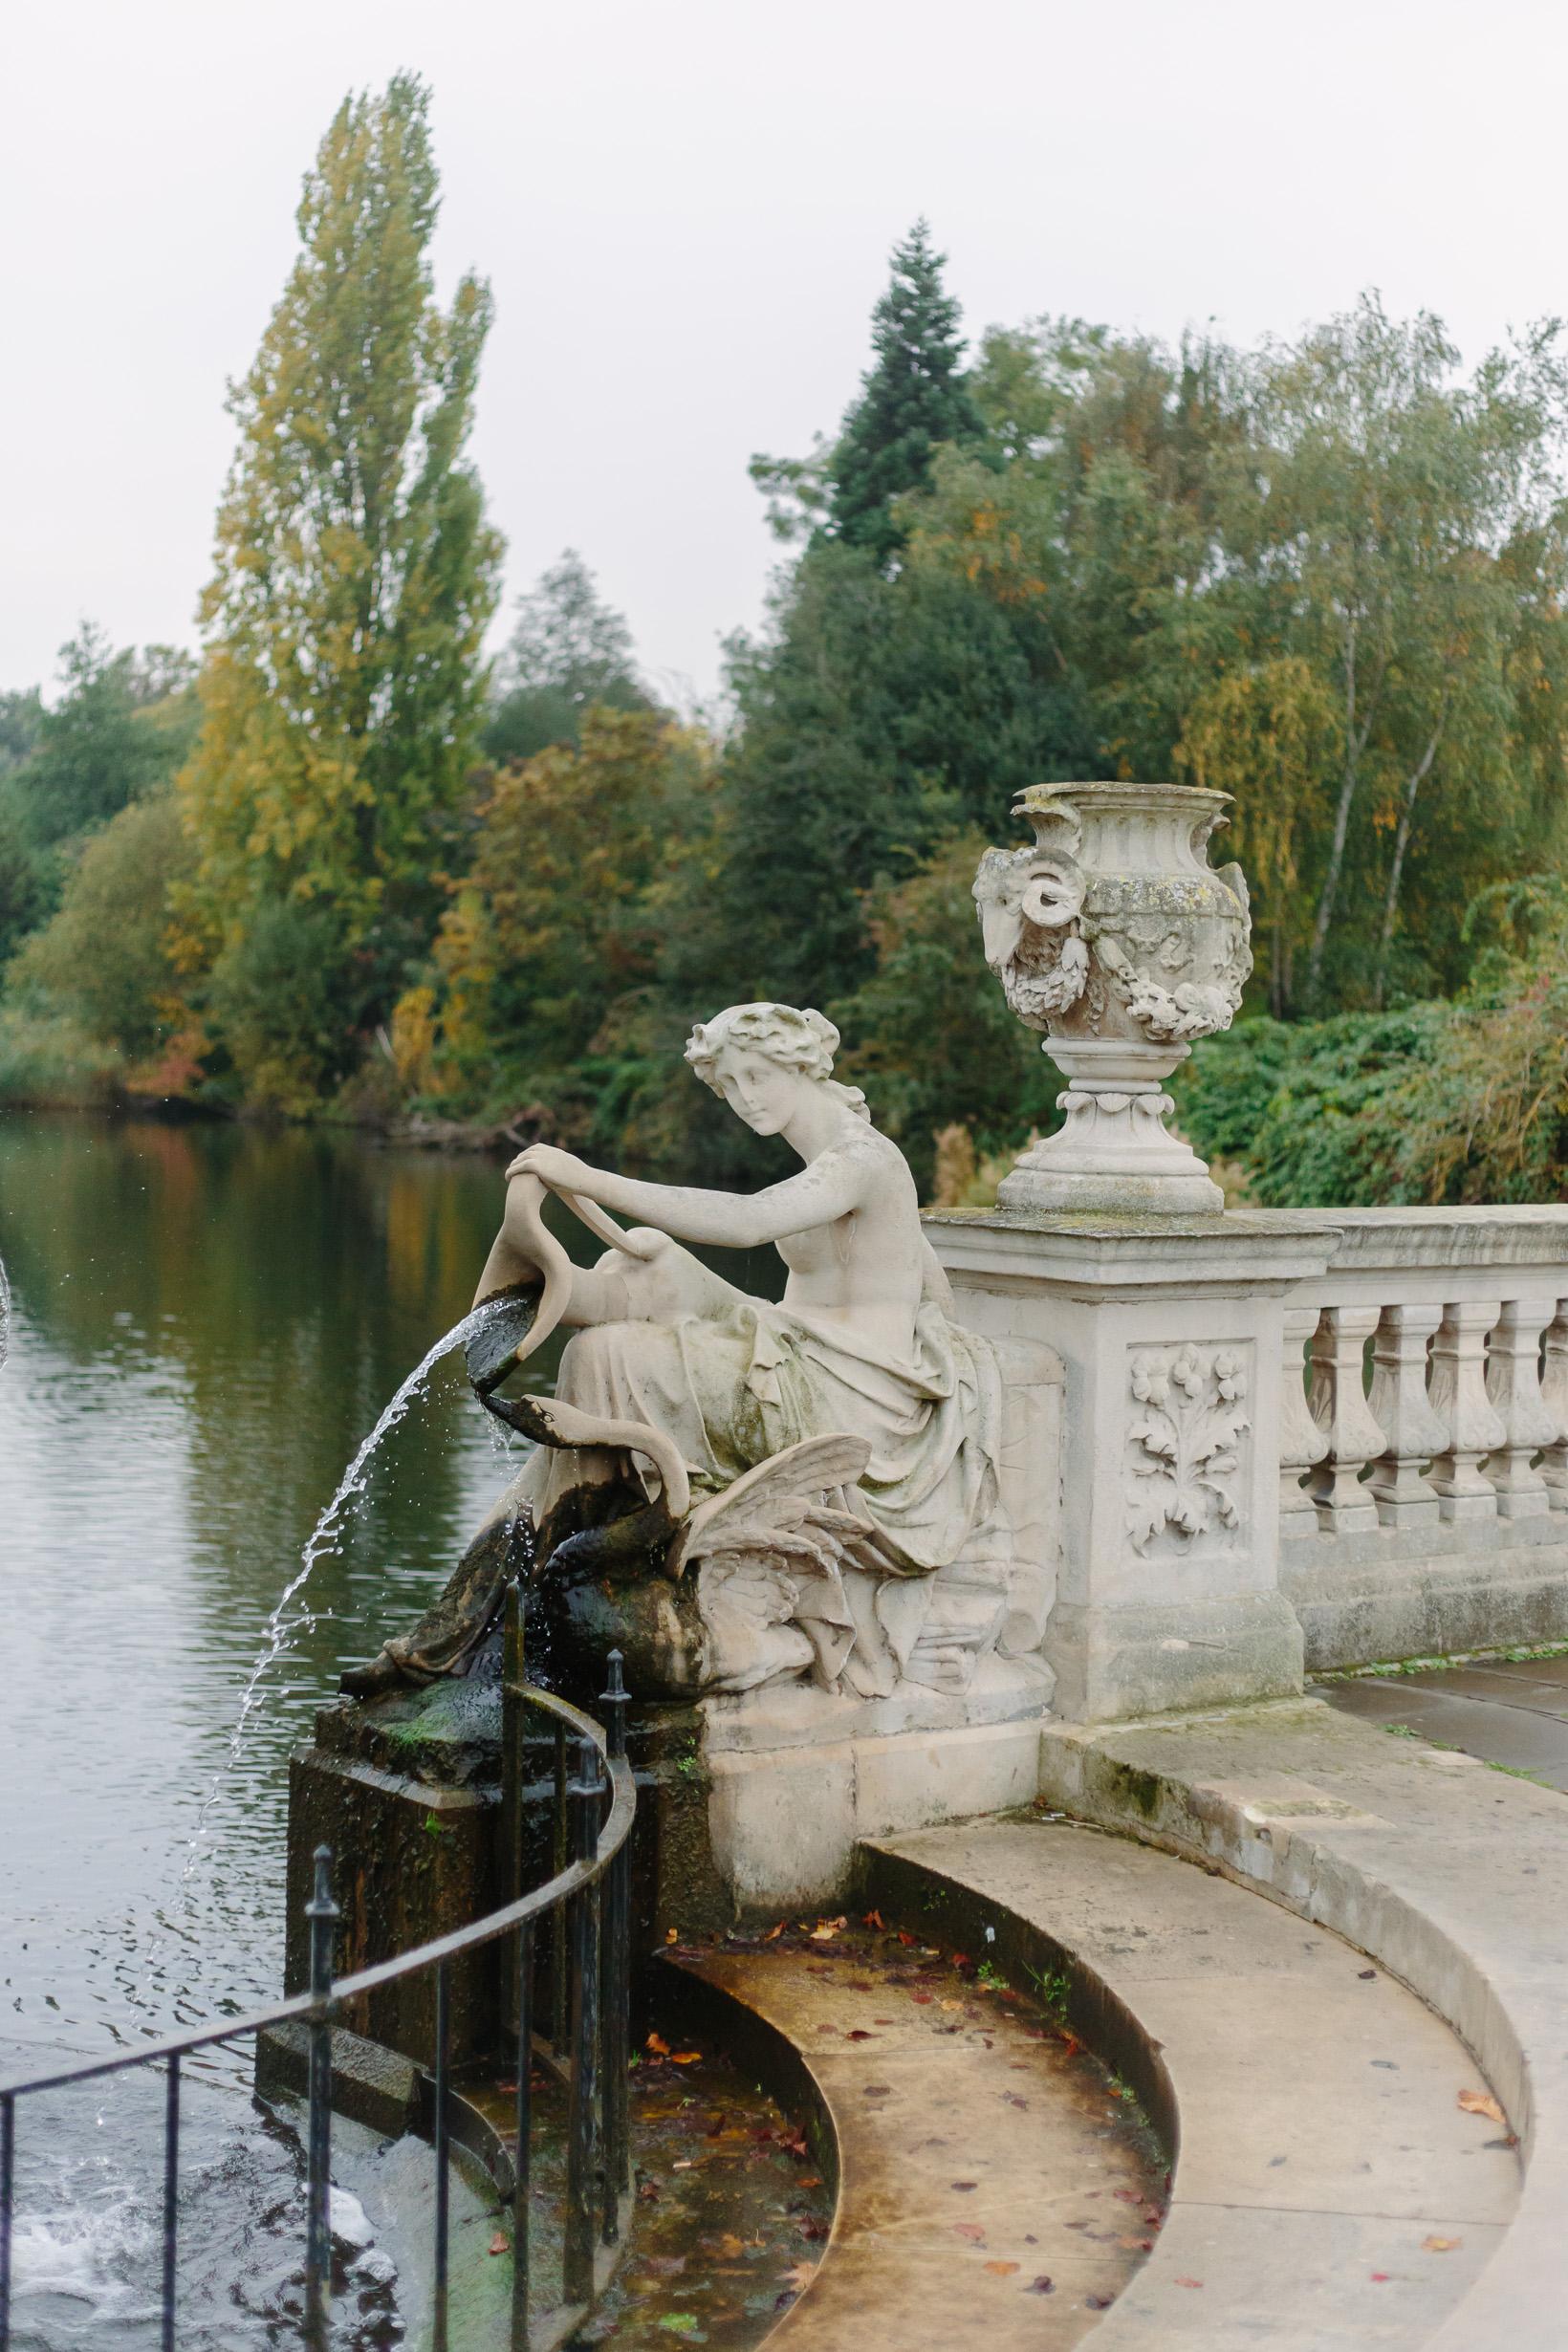 fall-in-hyde-park-london-4146